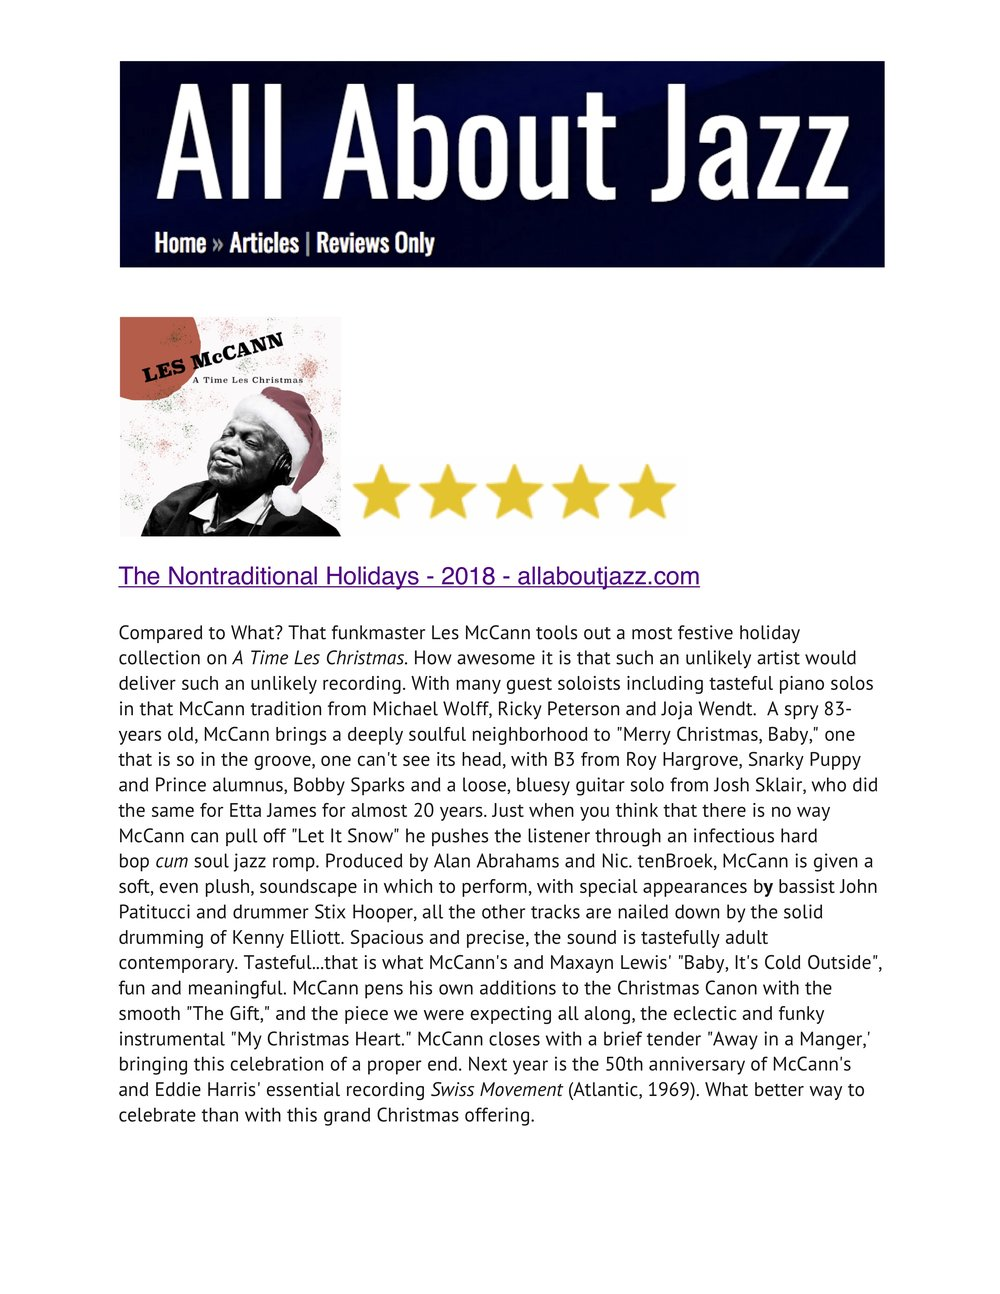 Les AllaboutJazz review v2.jpg